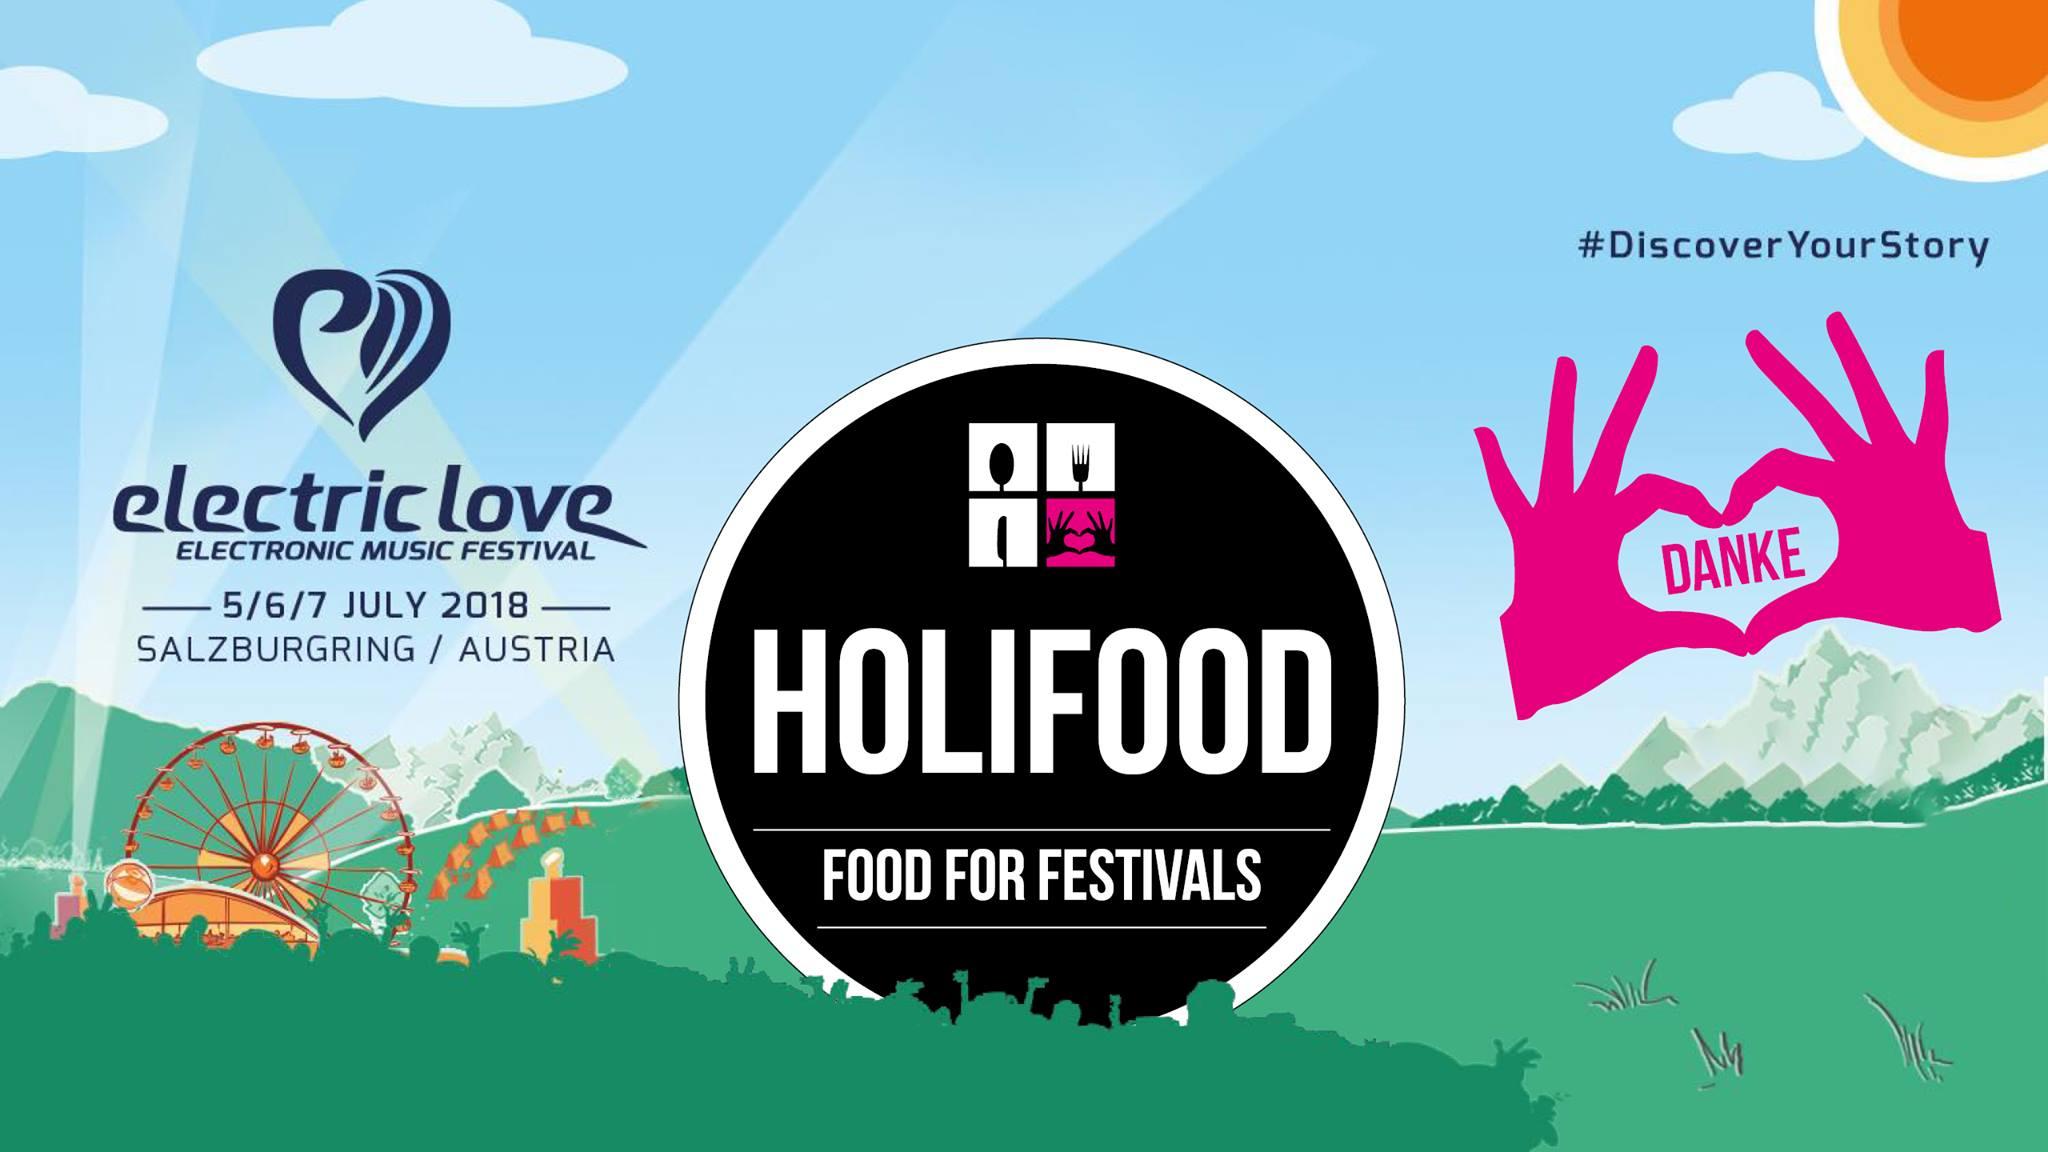 Electric-Love-Festival-Holifood-Food-for-Festivals